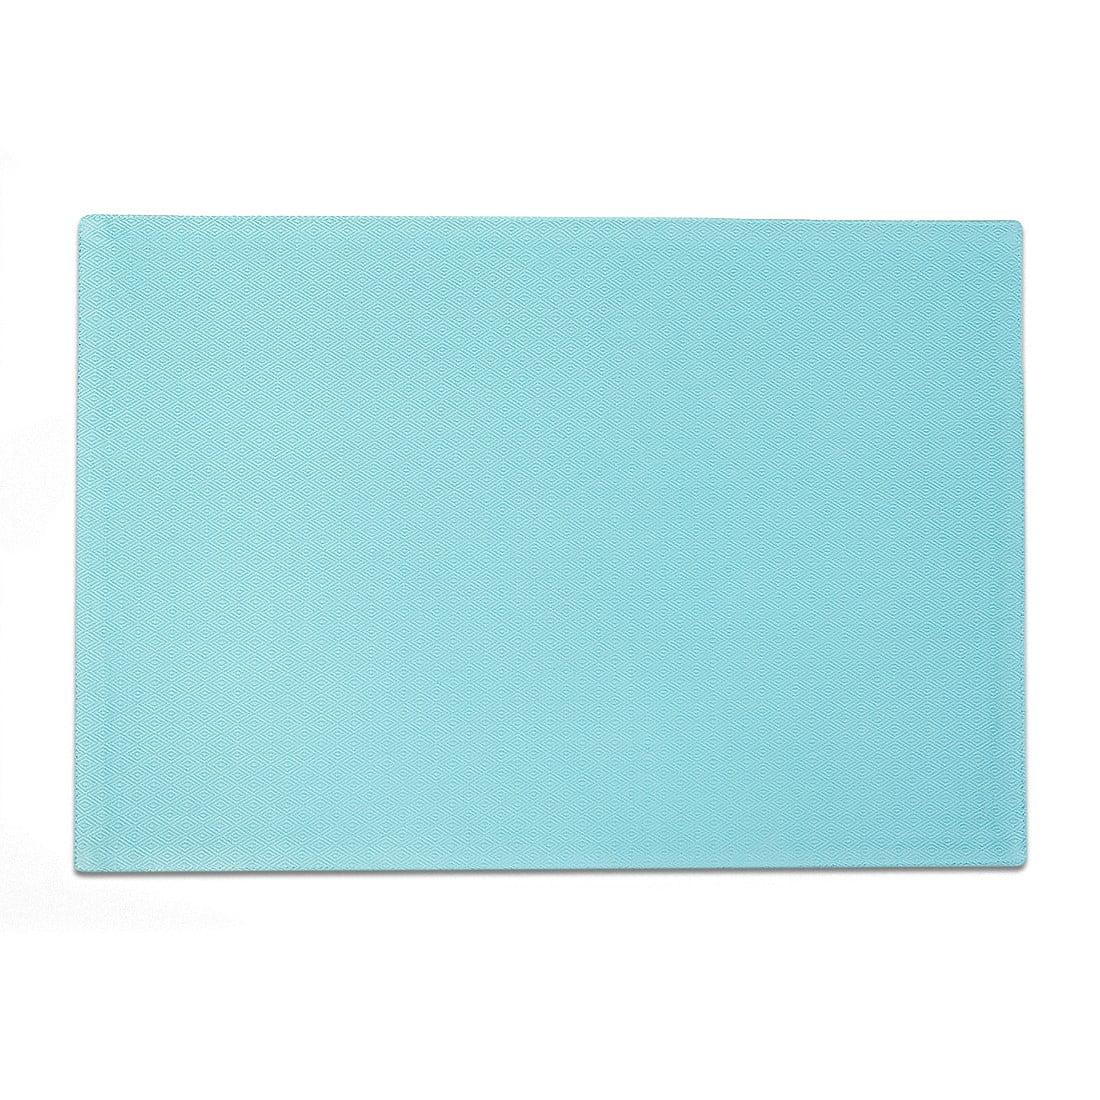 Linen Tablecloth Diamond Texture Premium Placemat Set (Set of 4), Sky Blue by Linen Tablecloth